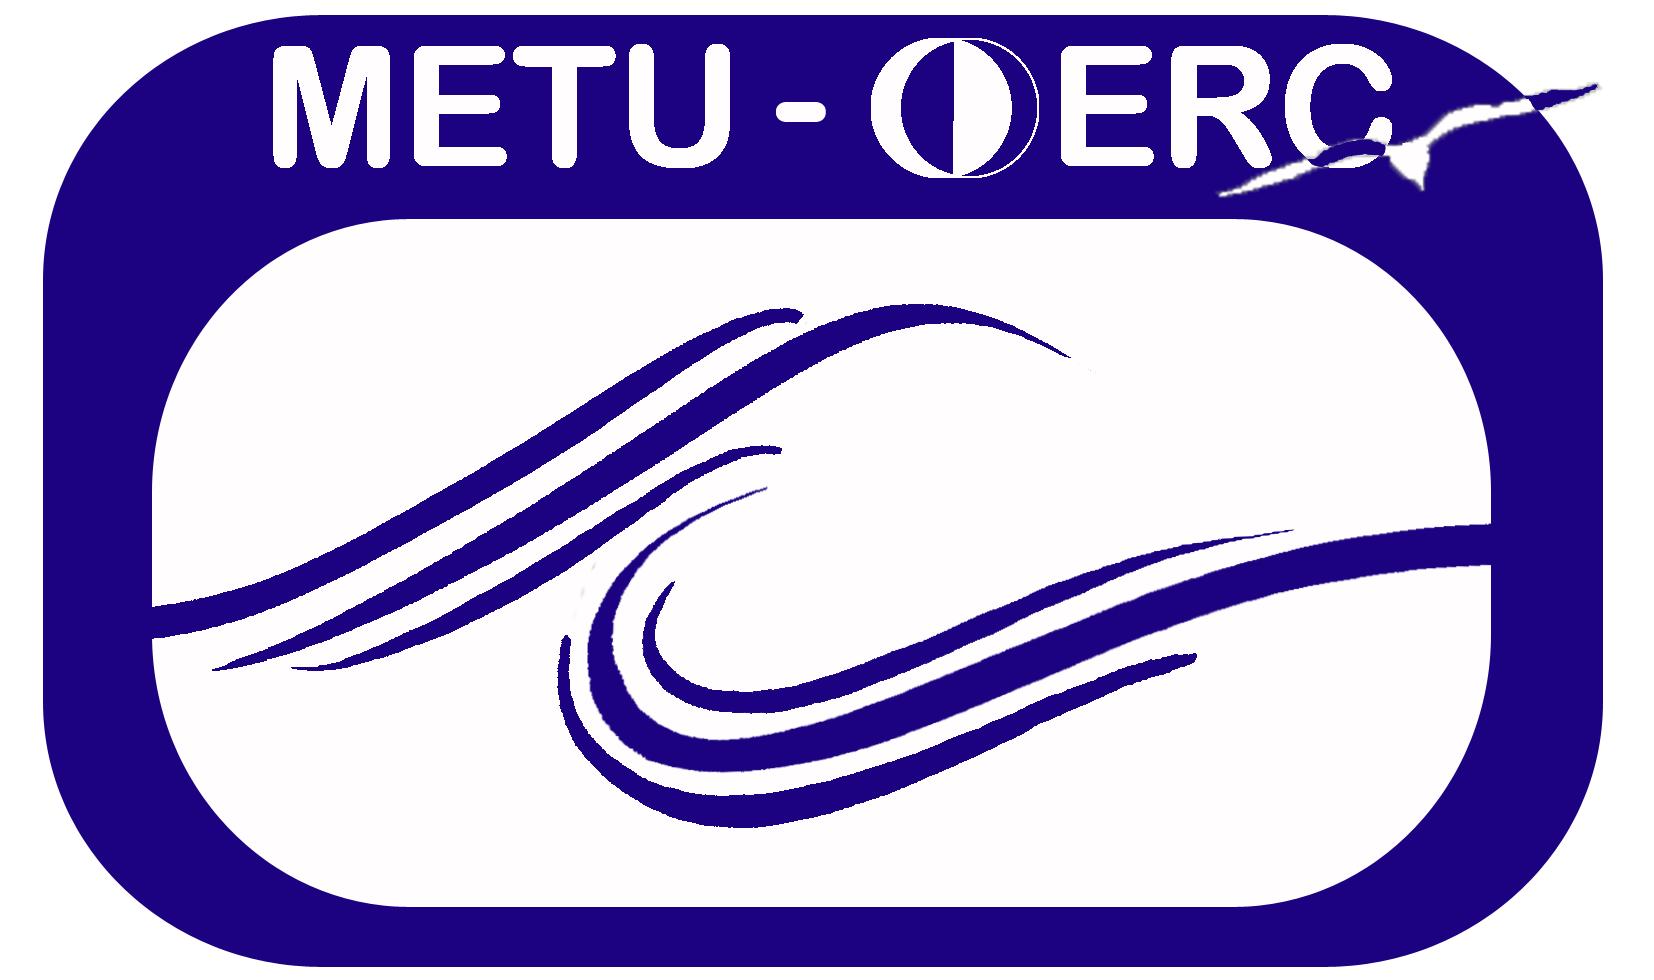 METU-OERC Web Site